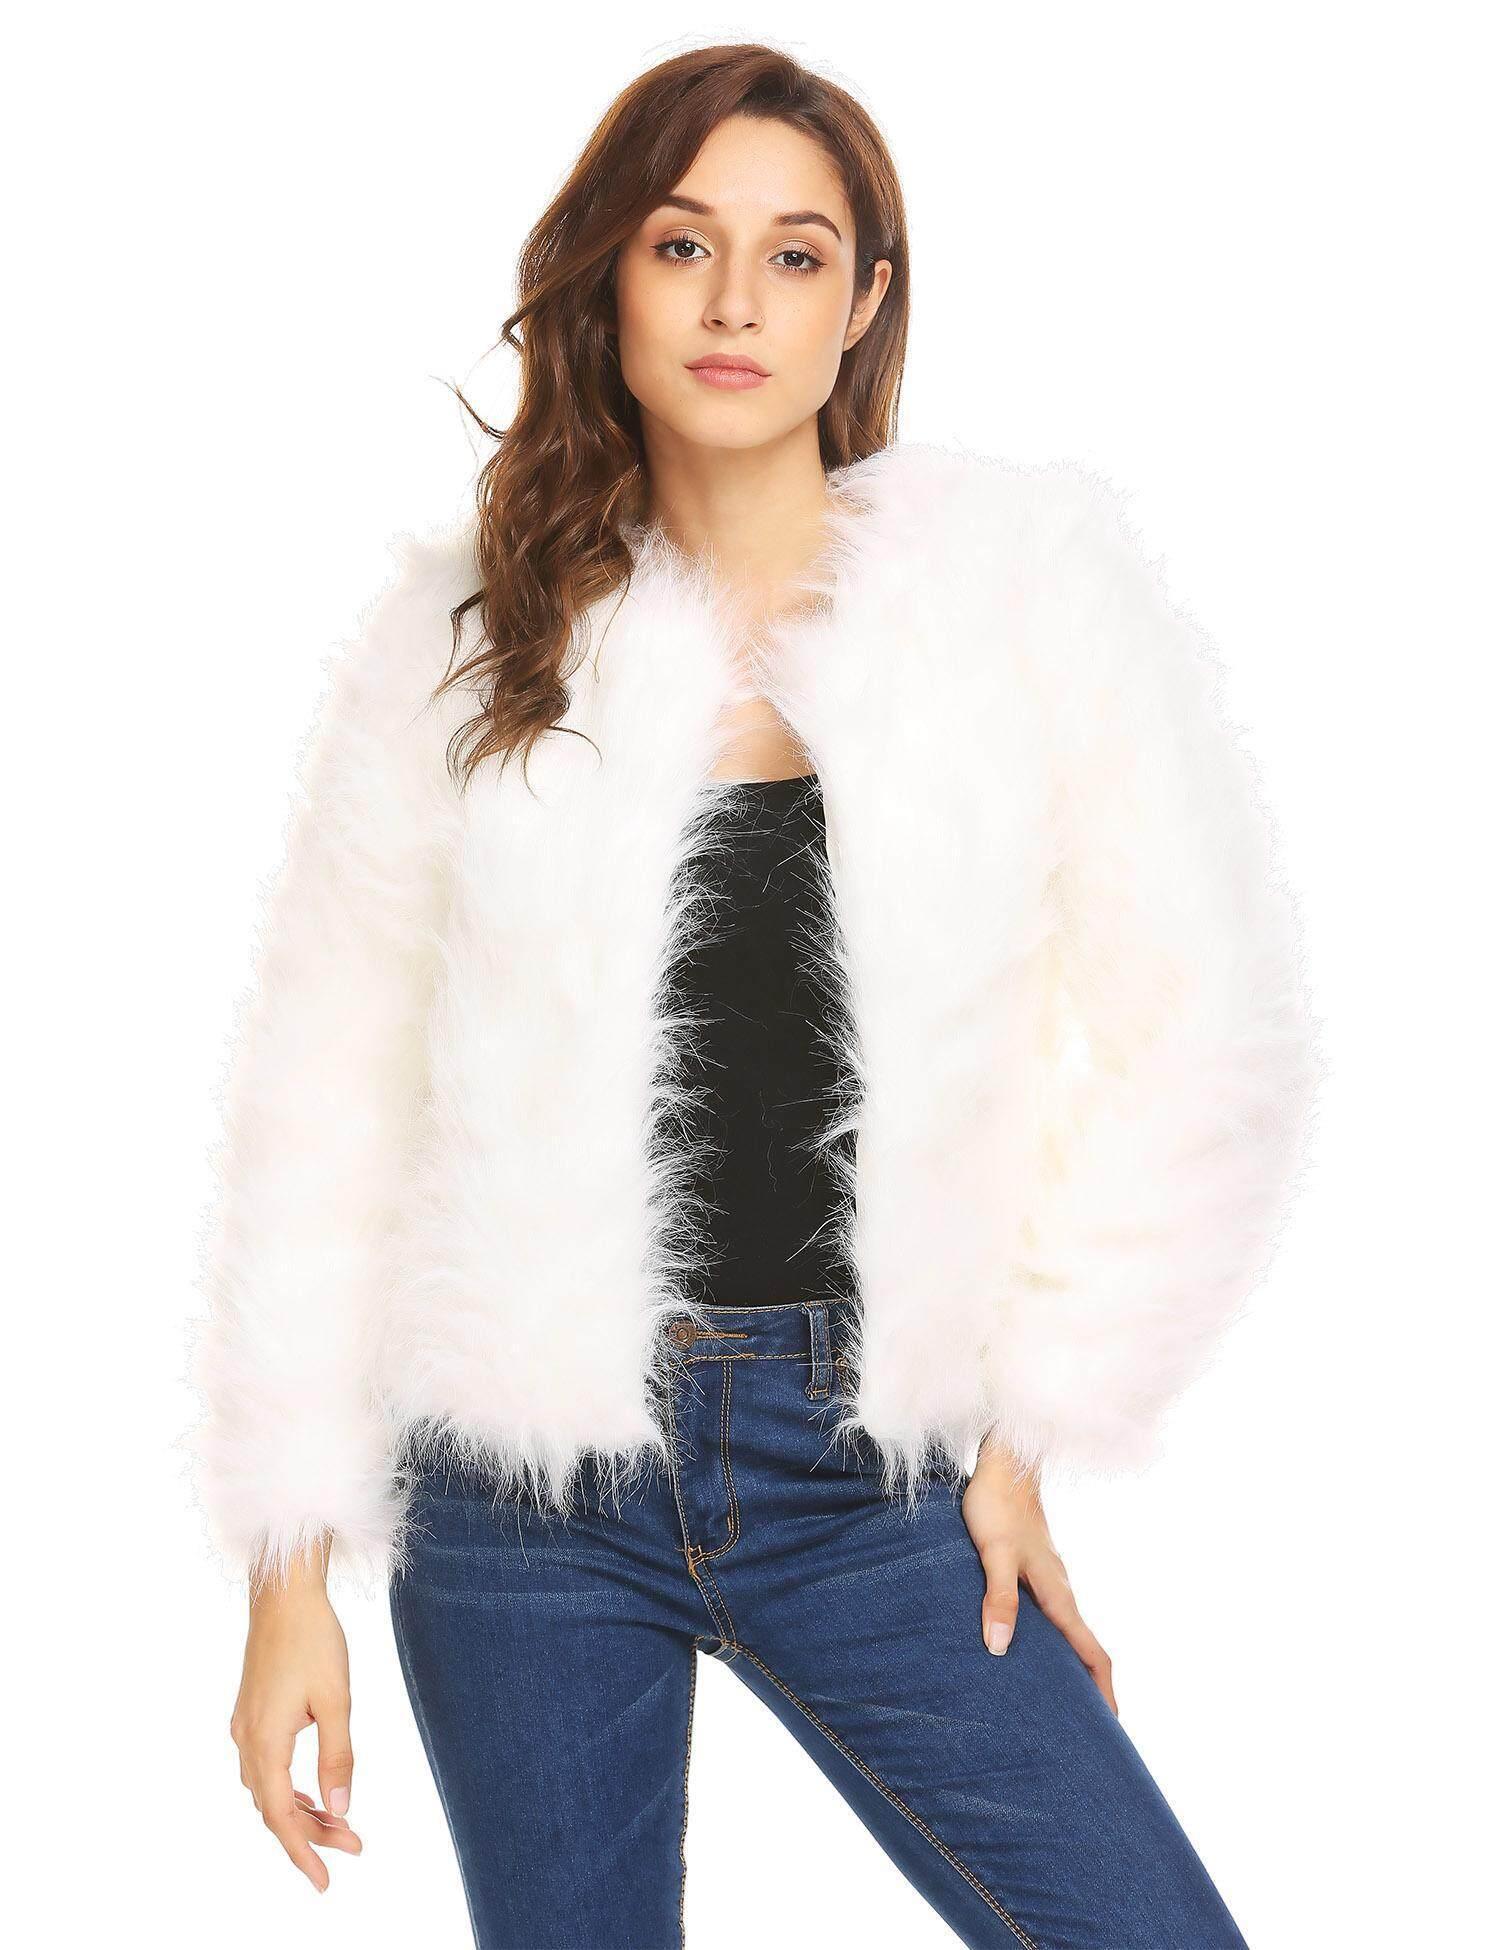 49437d1c6e6 Cyber Clearance Sale Fashion Women Winter Warm Faux Fur O-Neck Long Sleeve  Short Coat